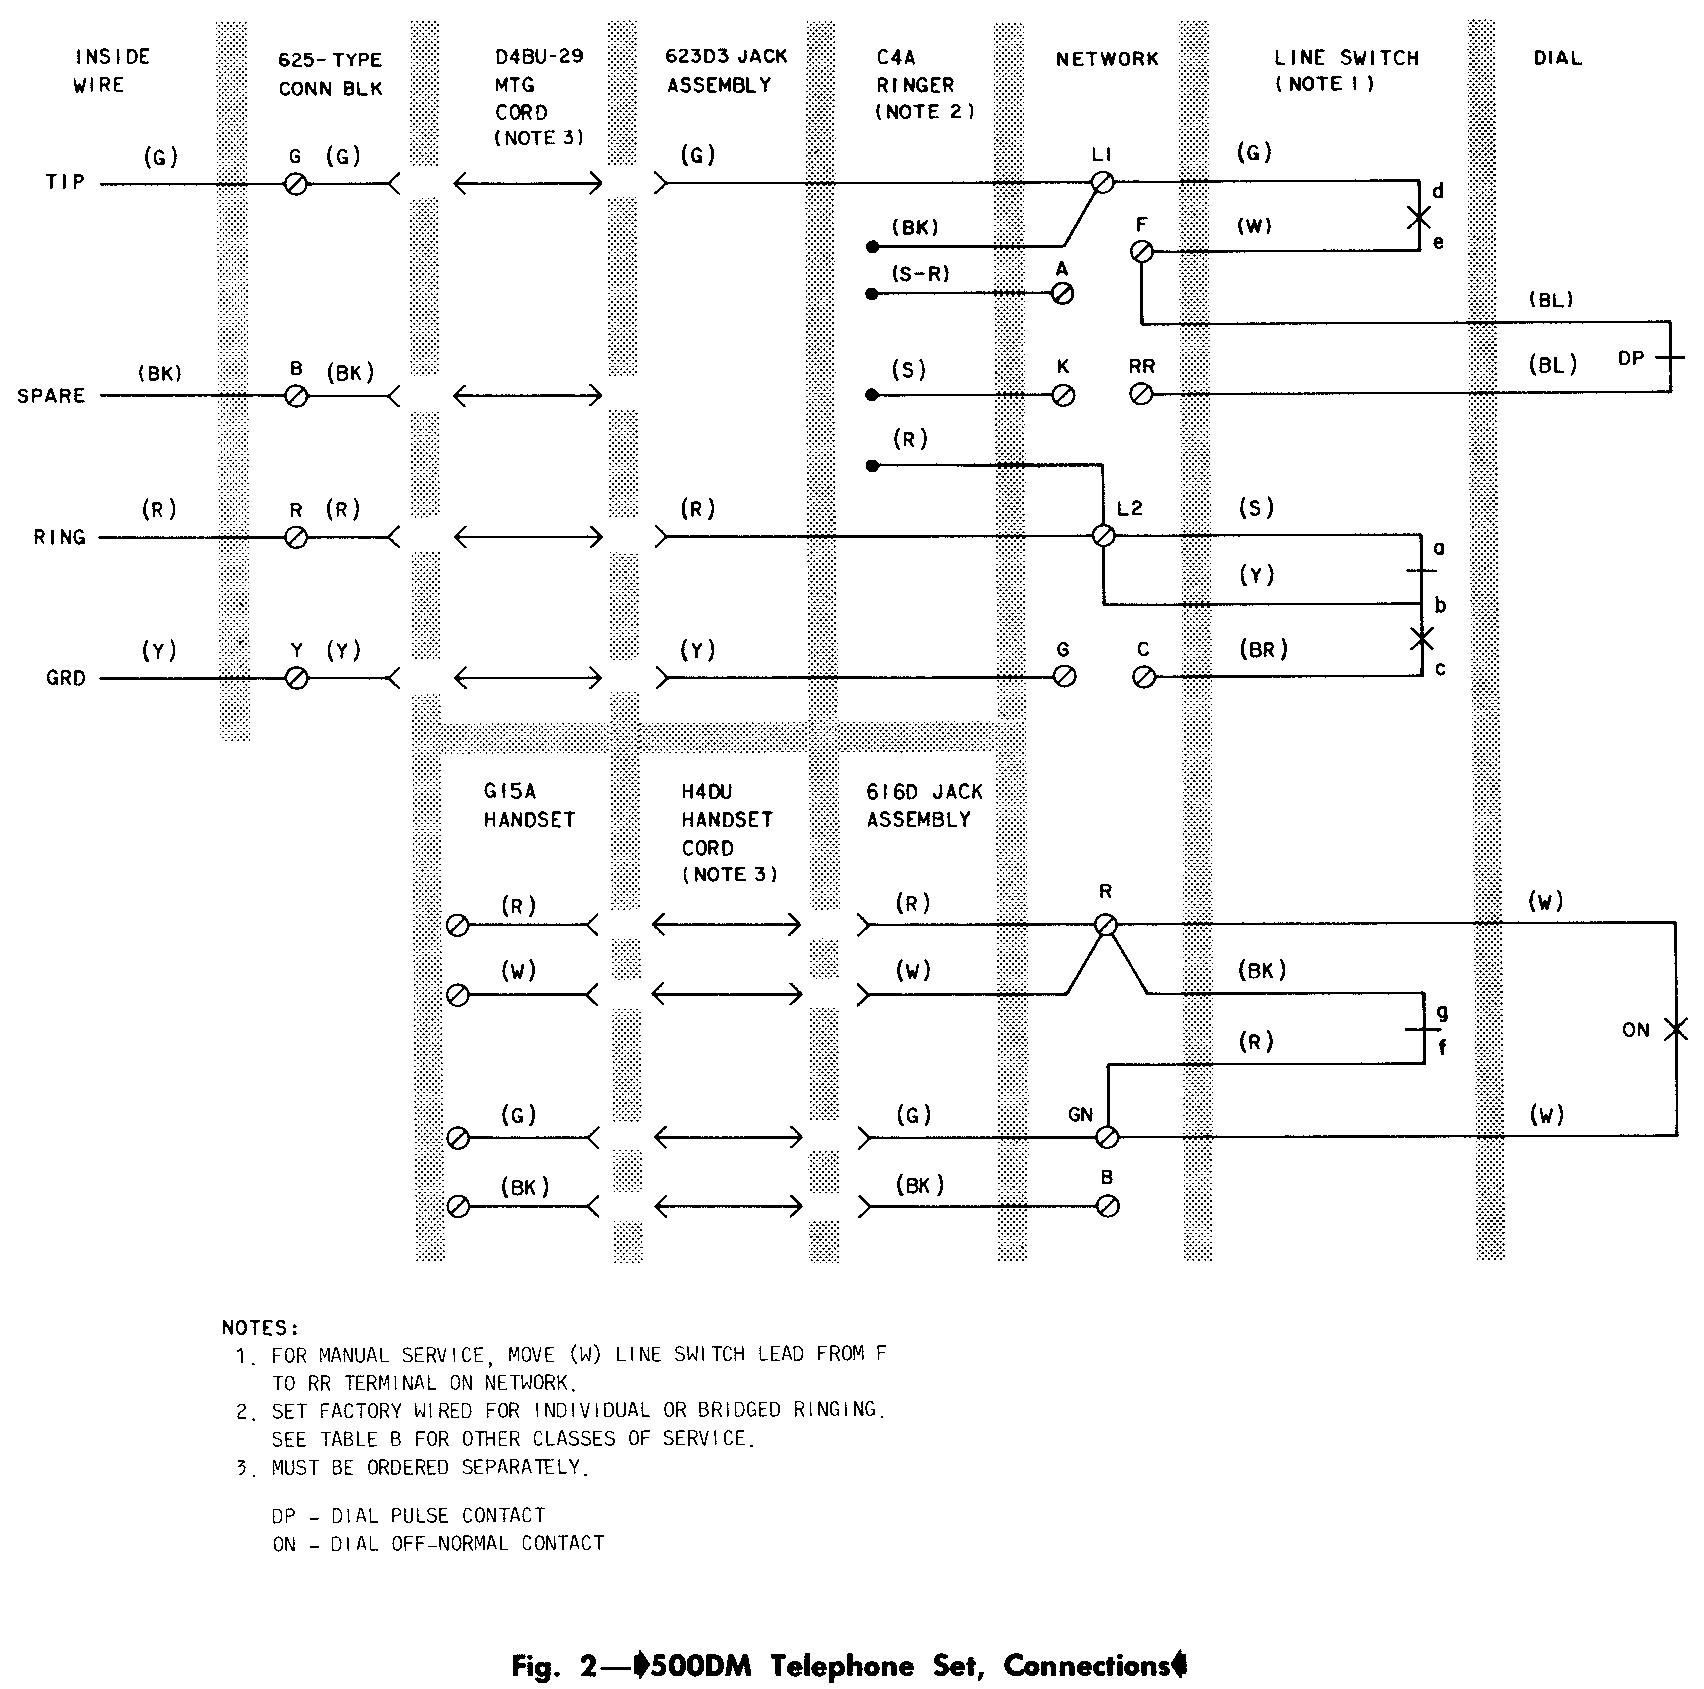 Telephone Wiring Diagram Outside Box | Wiring Diagram Image